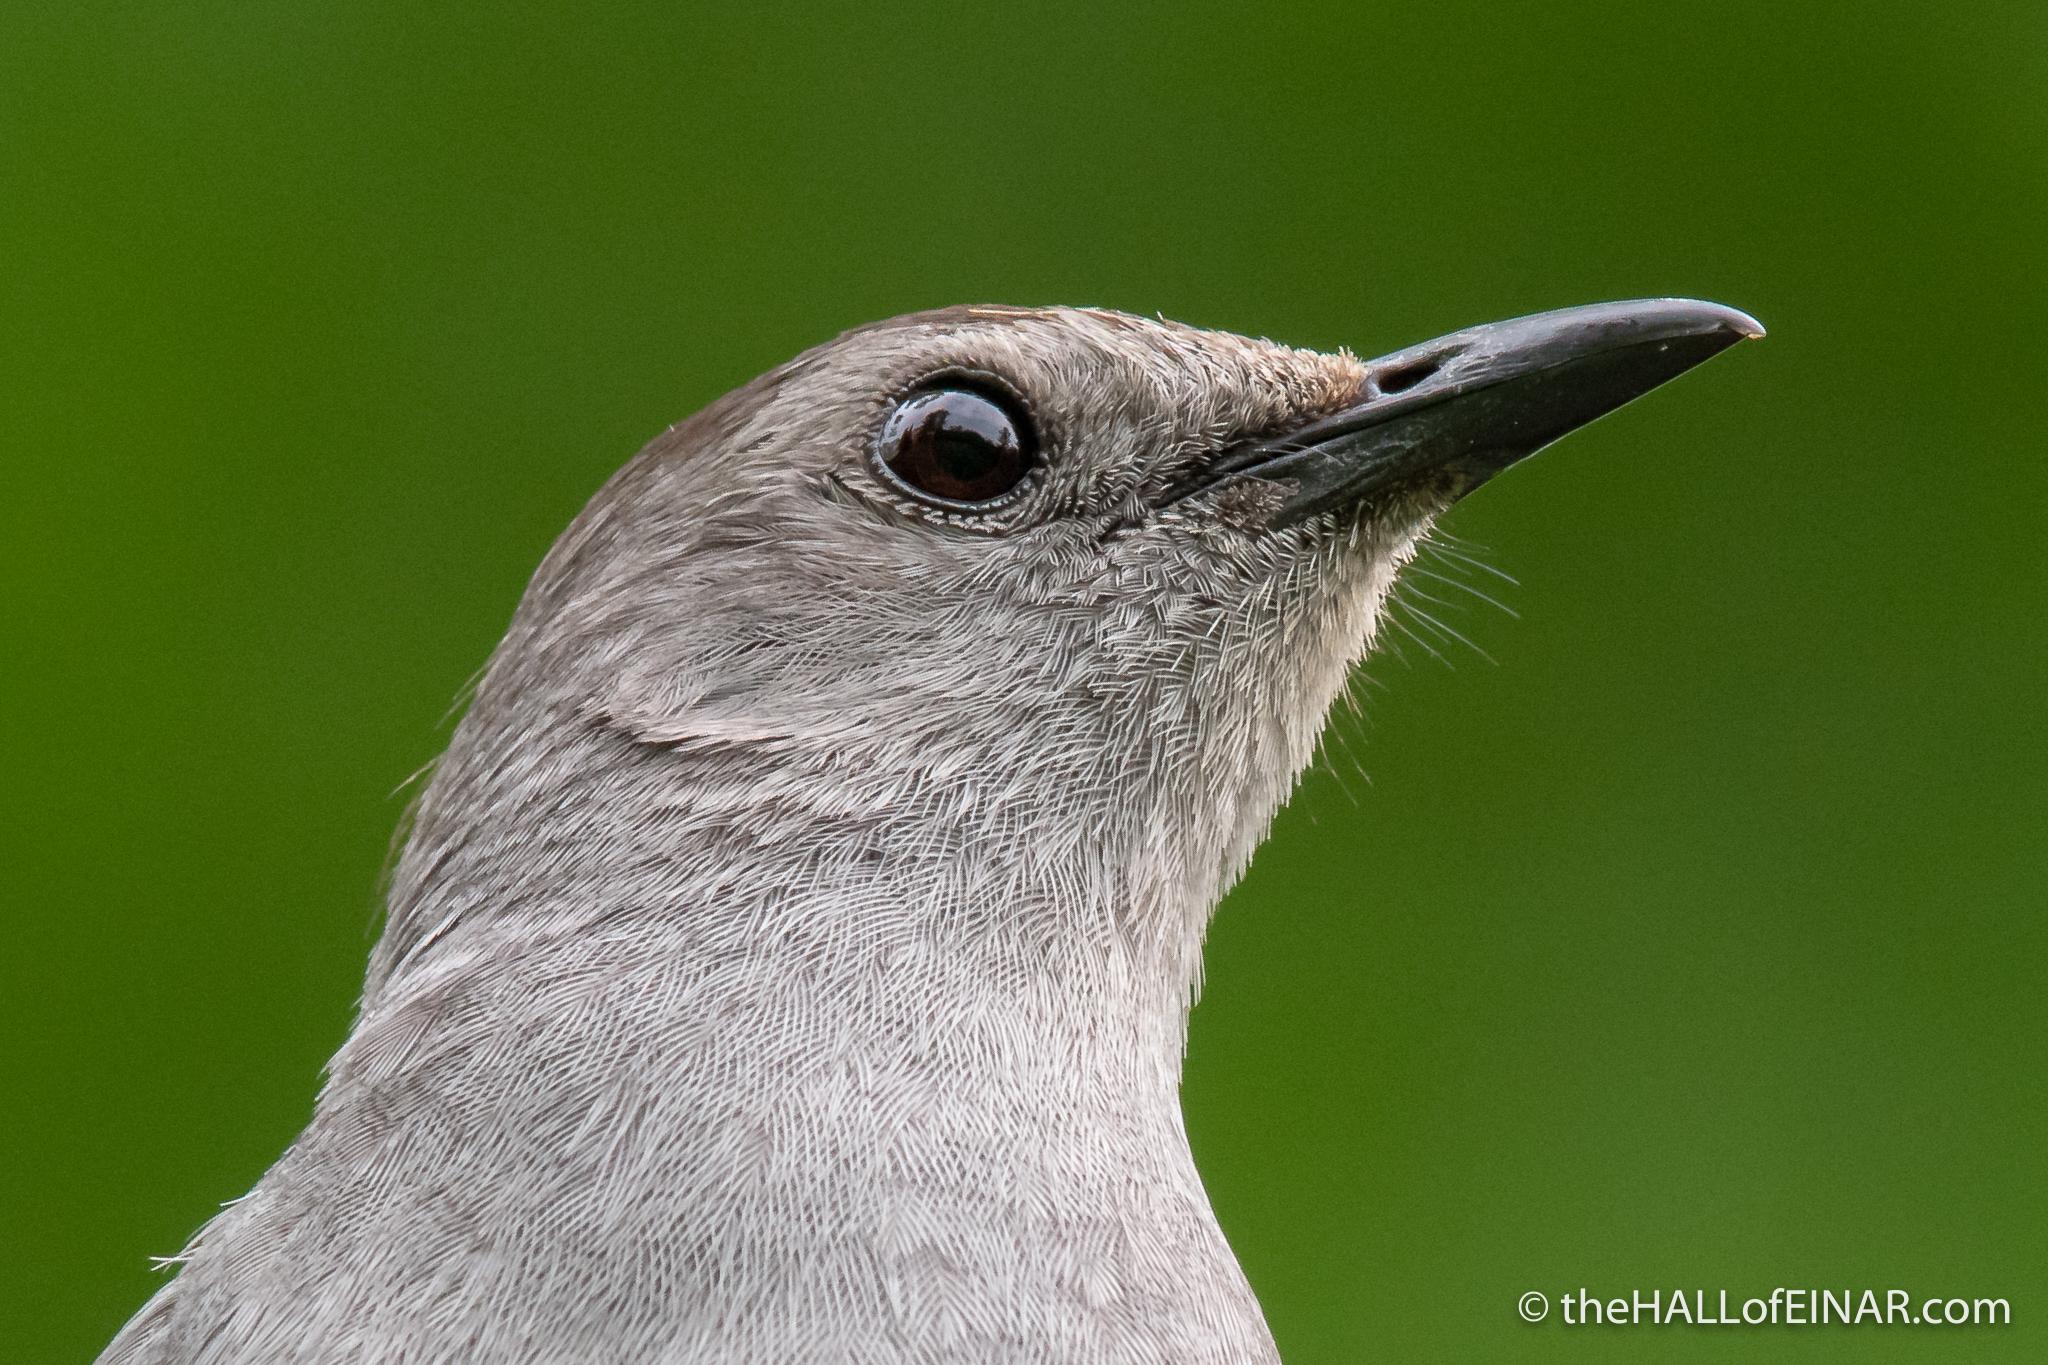 Gray Catbird - The Hall of Einar - photograph (c) David Bailey (not the)